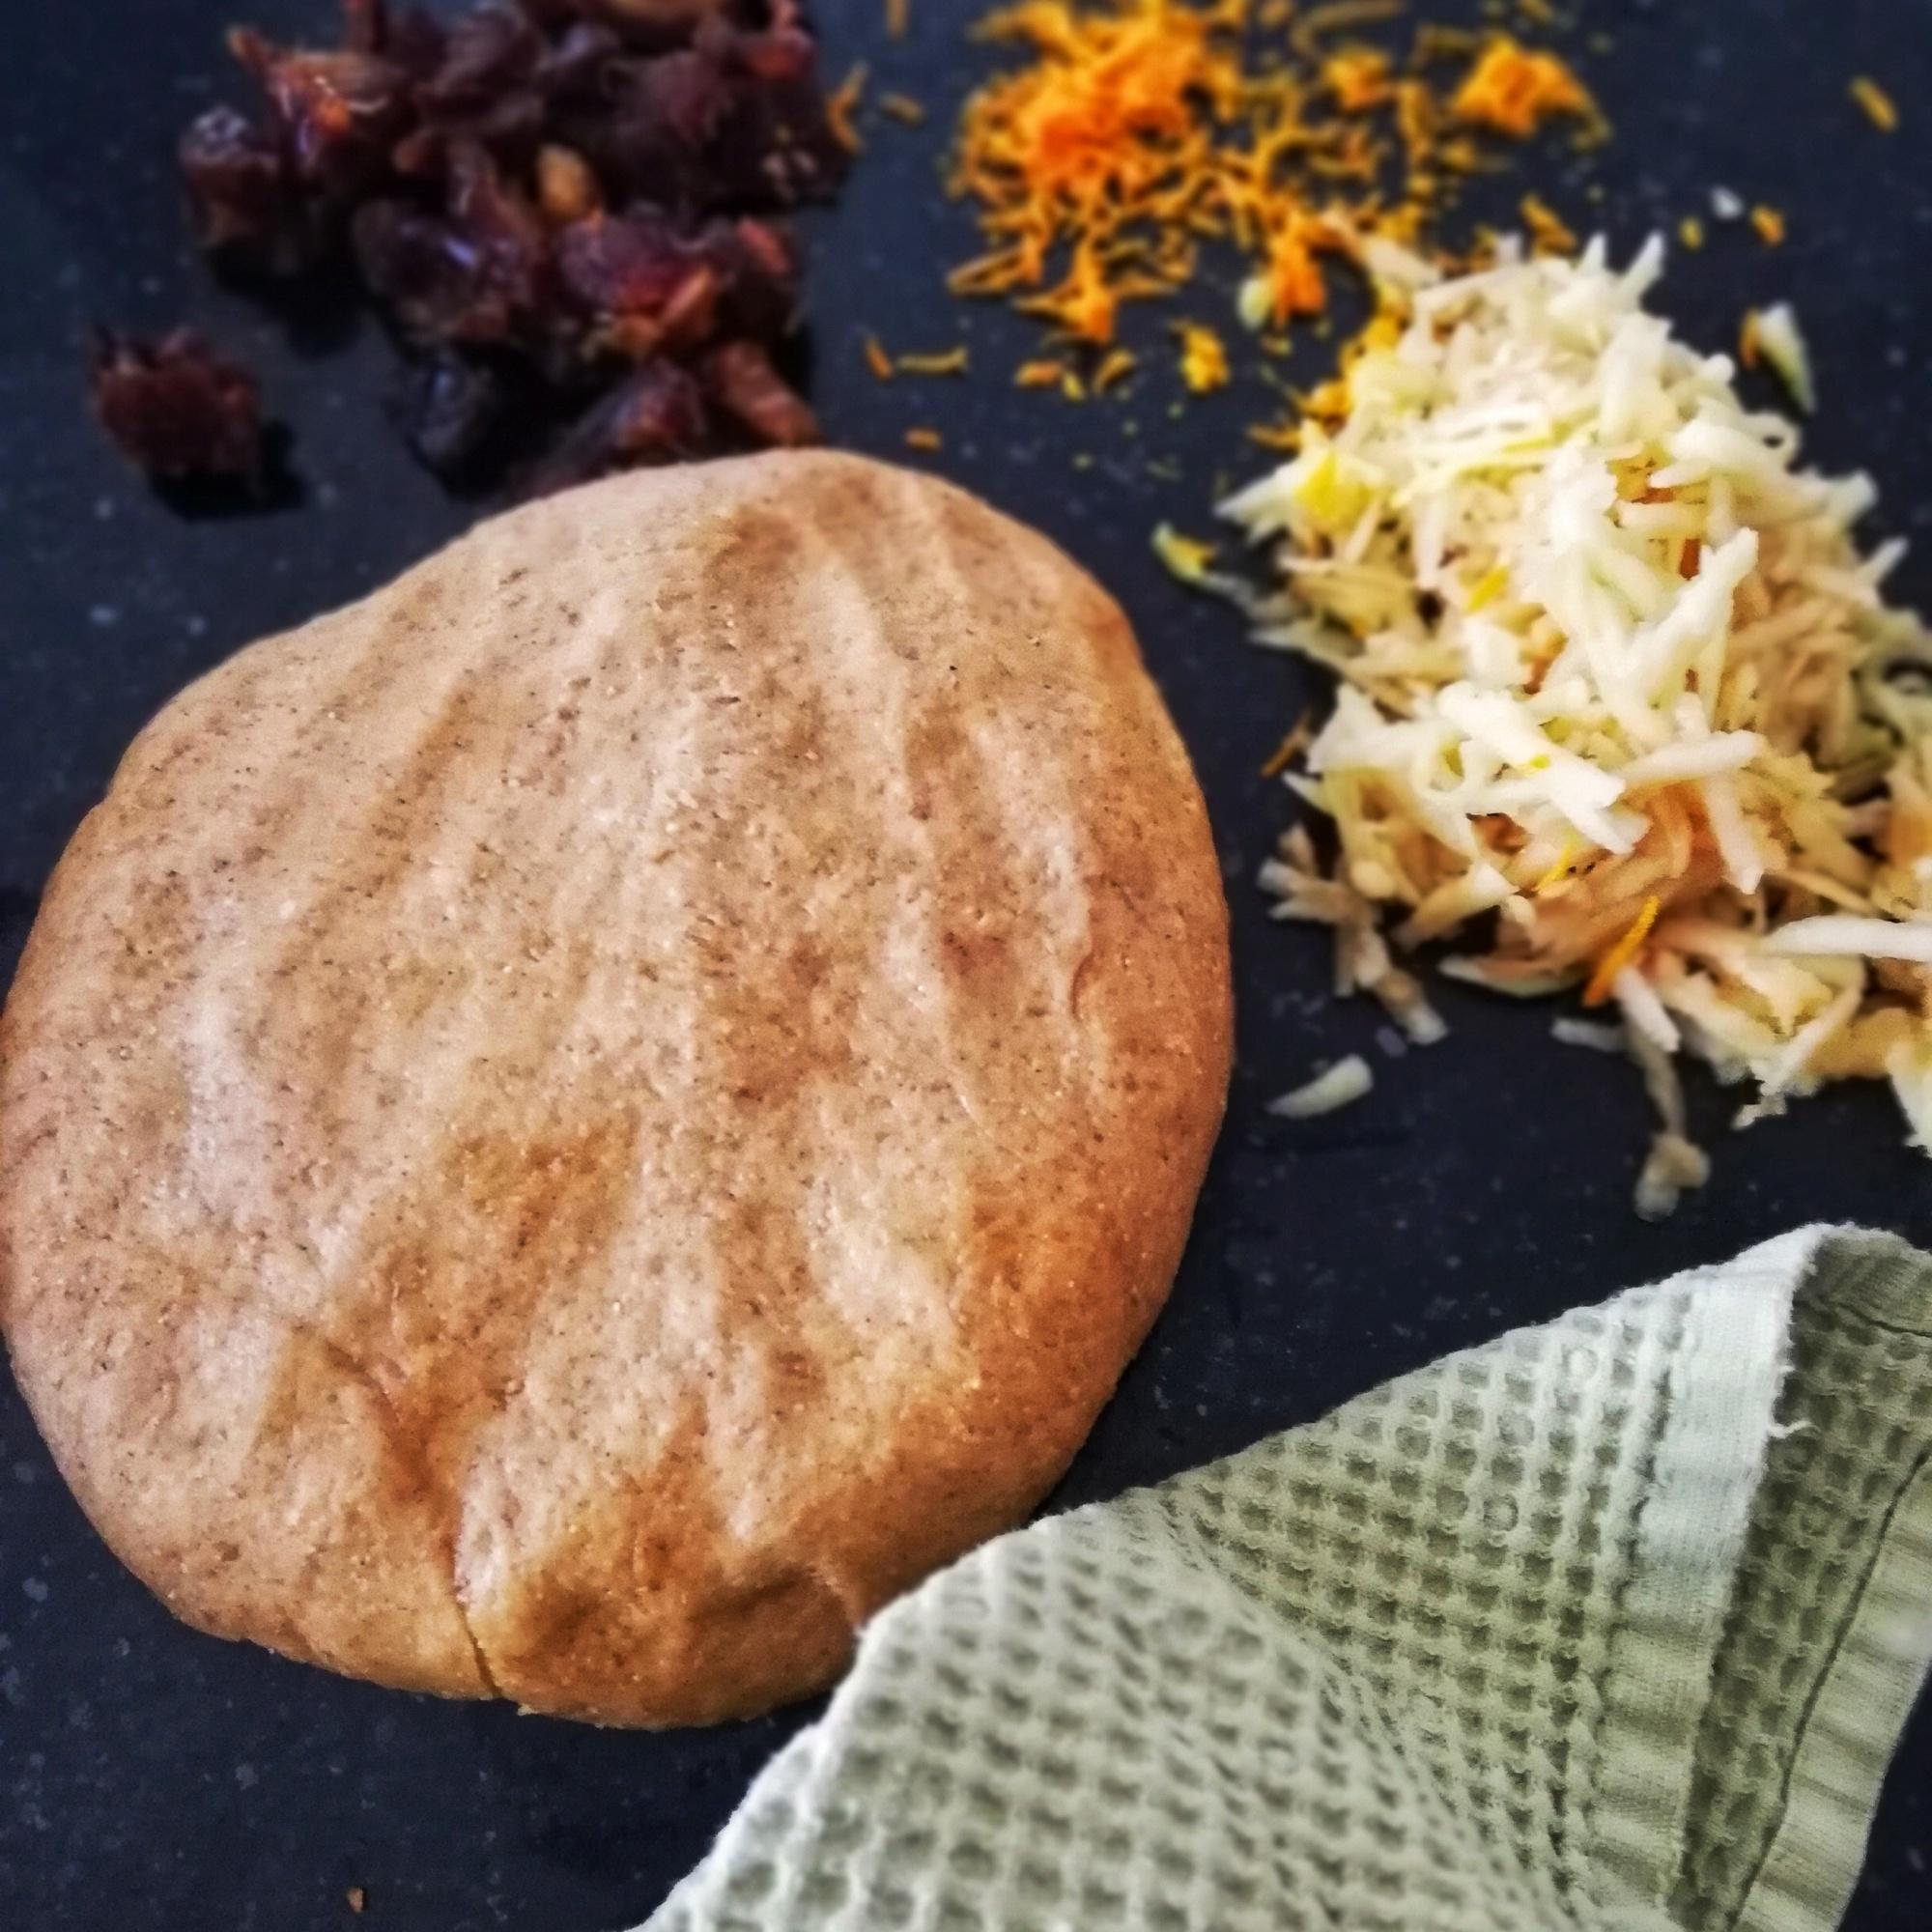 Food photography,Hot cross bun dough, shredded apple, chopped dates, orange zest